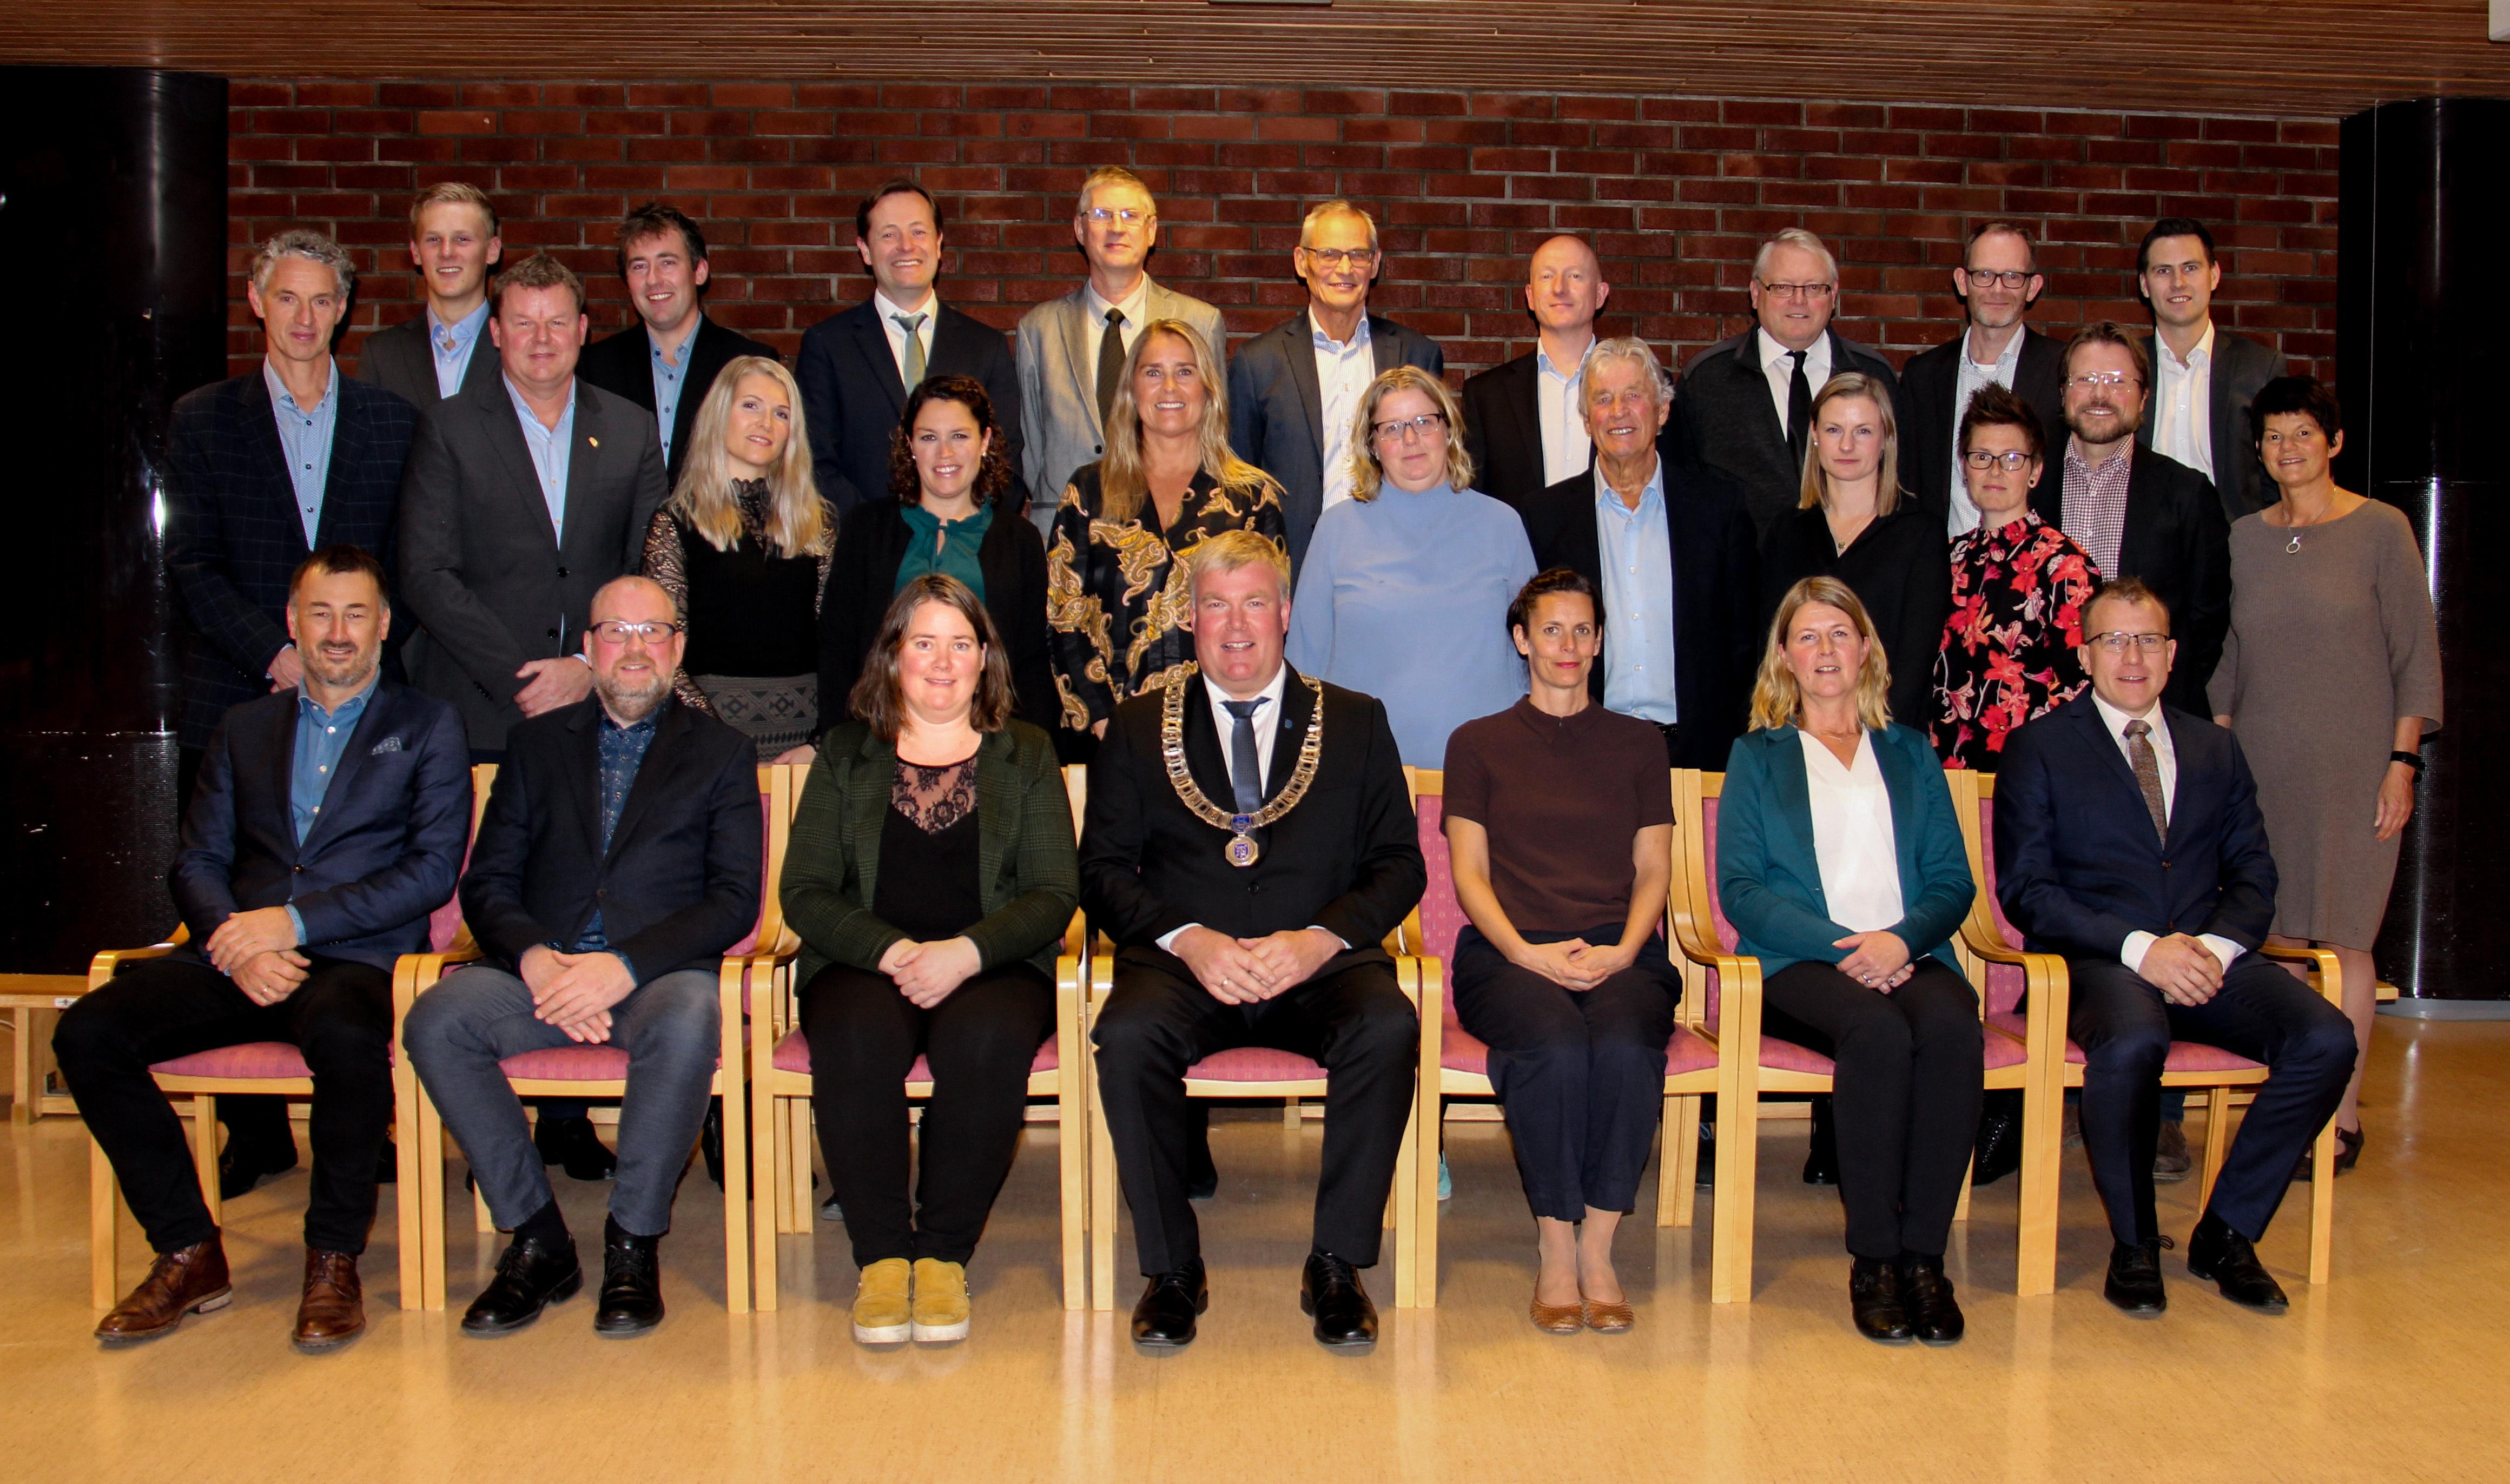 Kommunestyret 2019 - 2023 c.jpg